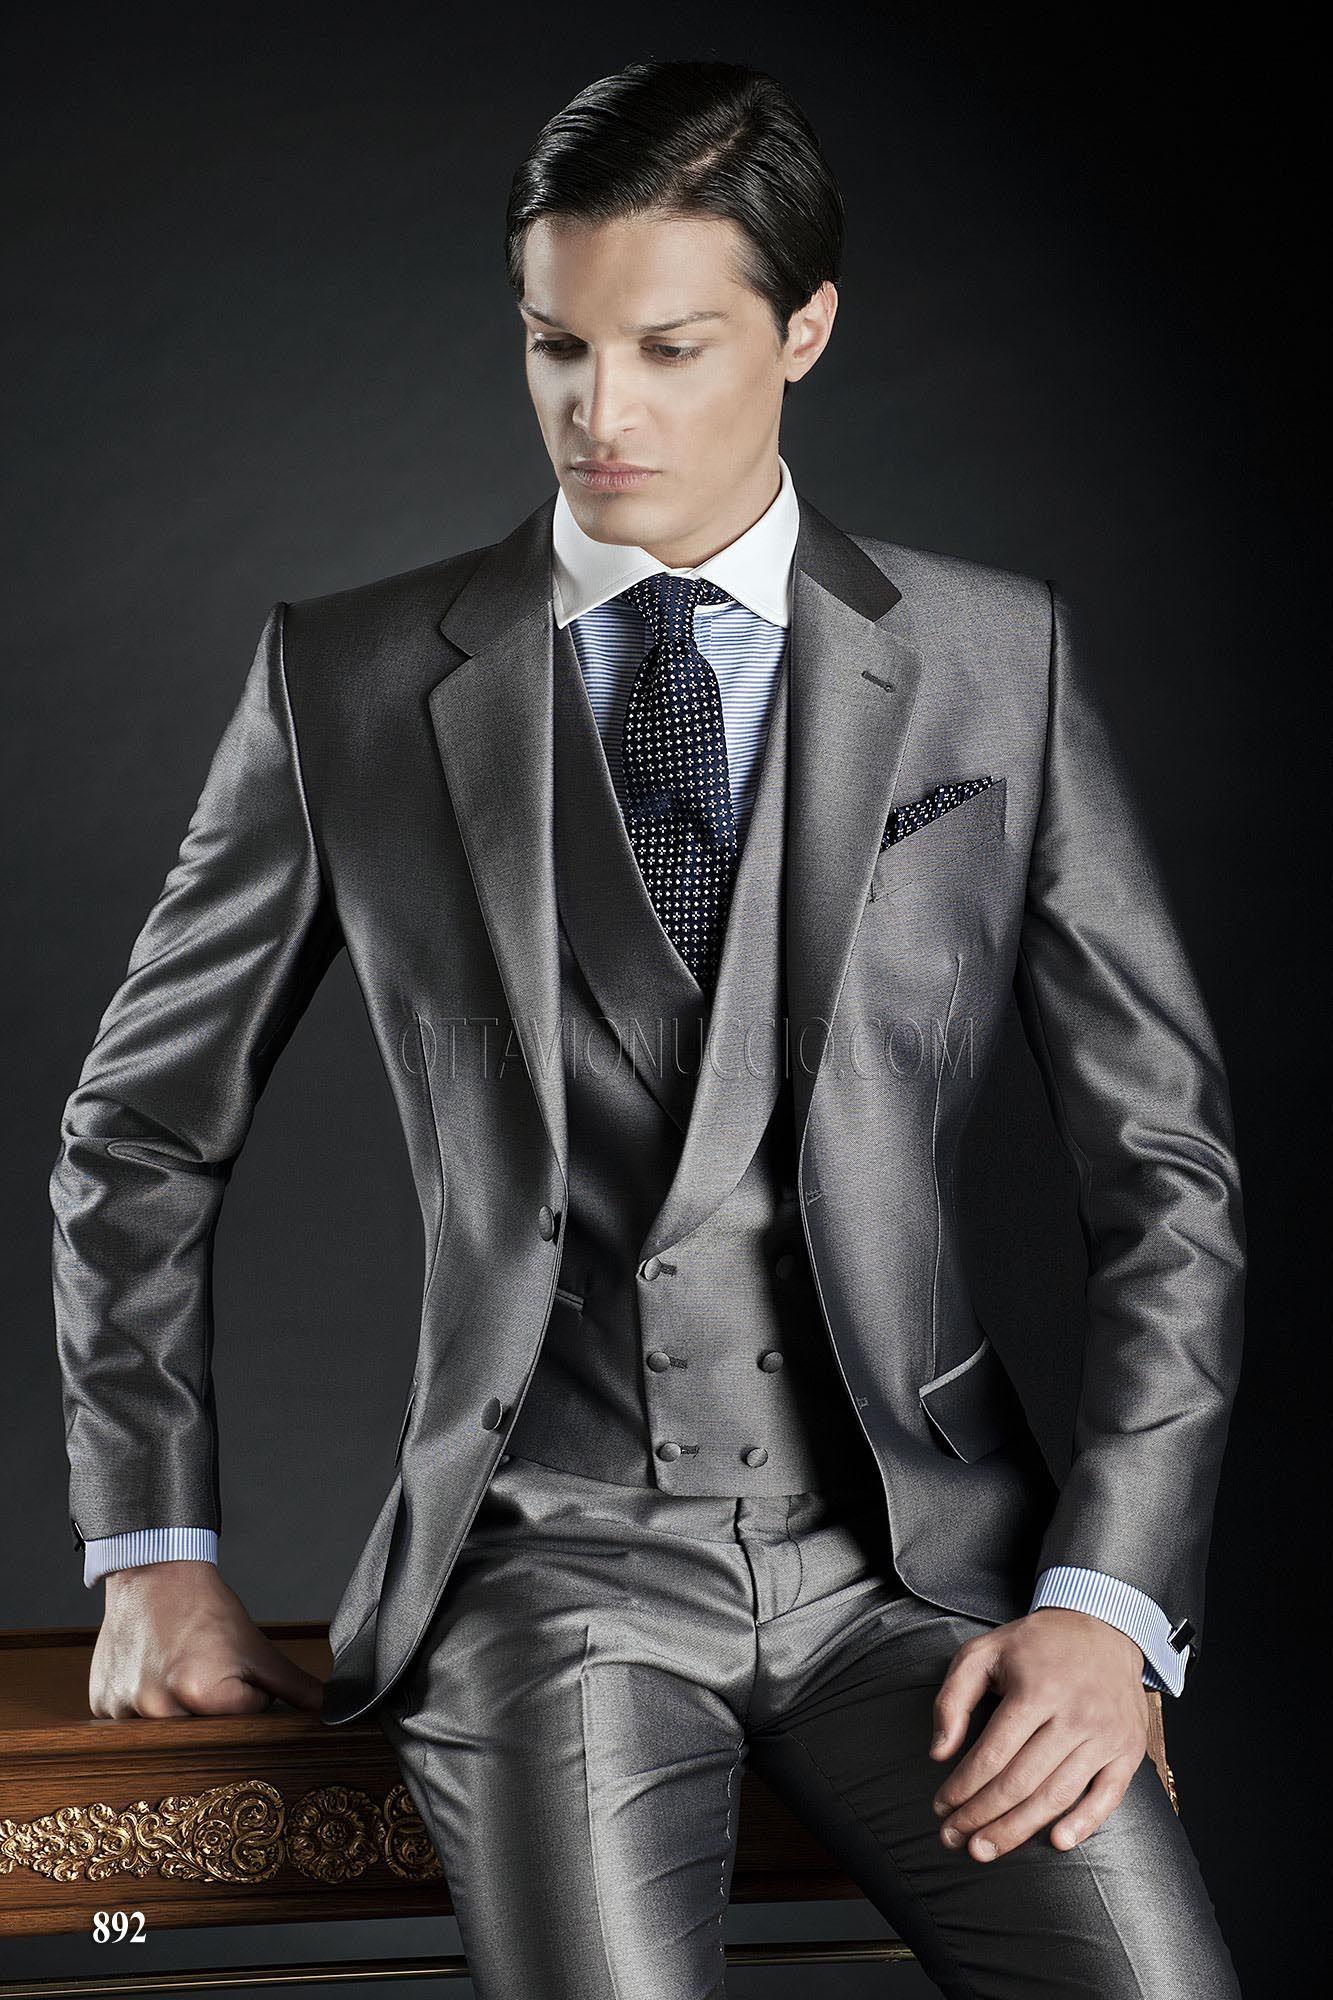 ONGala 892 - Italian groom Suits in Metallic Grey | Edgy Suit ...